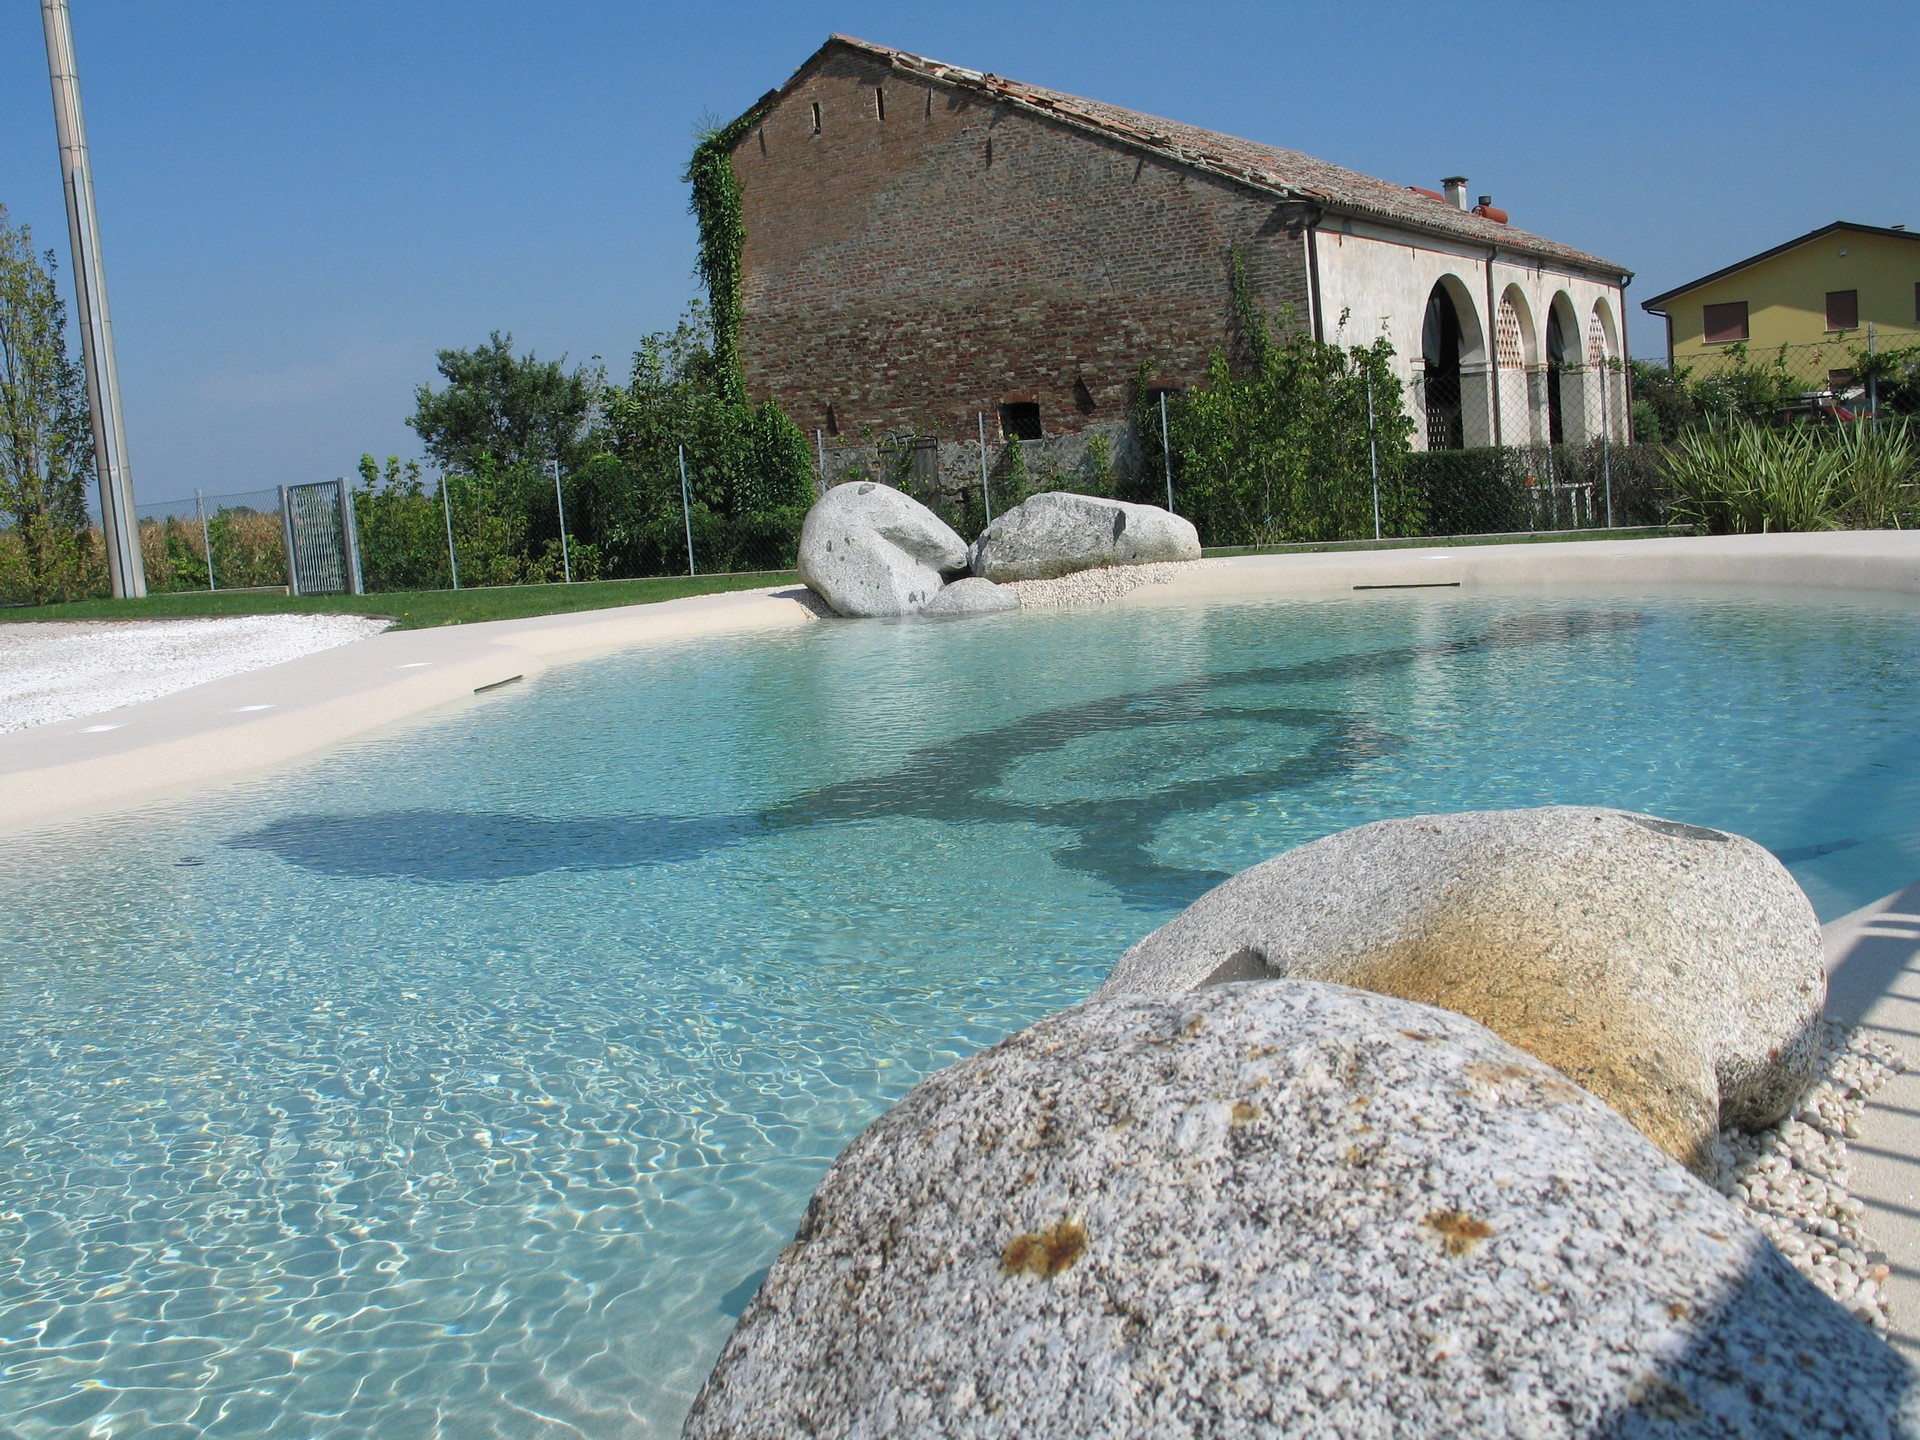 piscina-naturale-biodesign-152